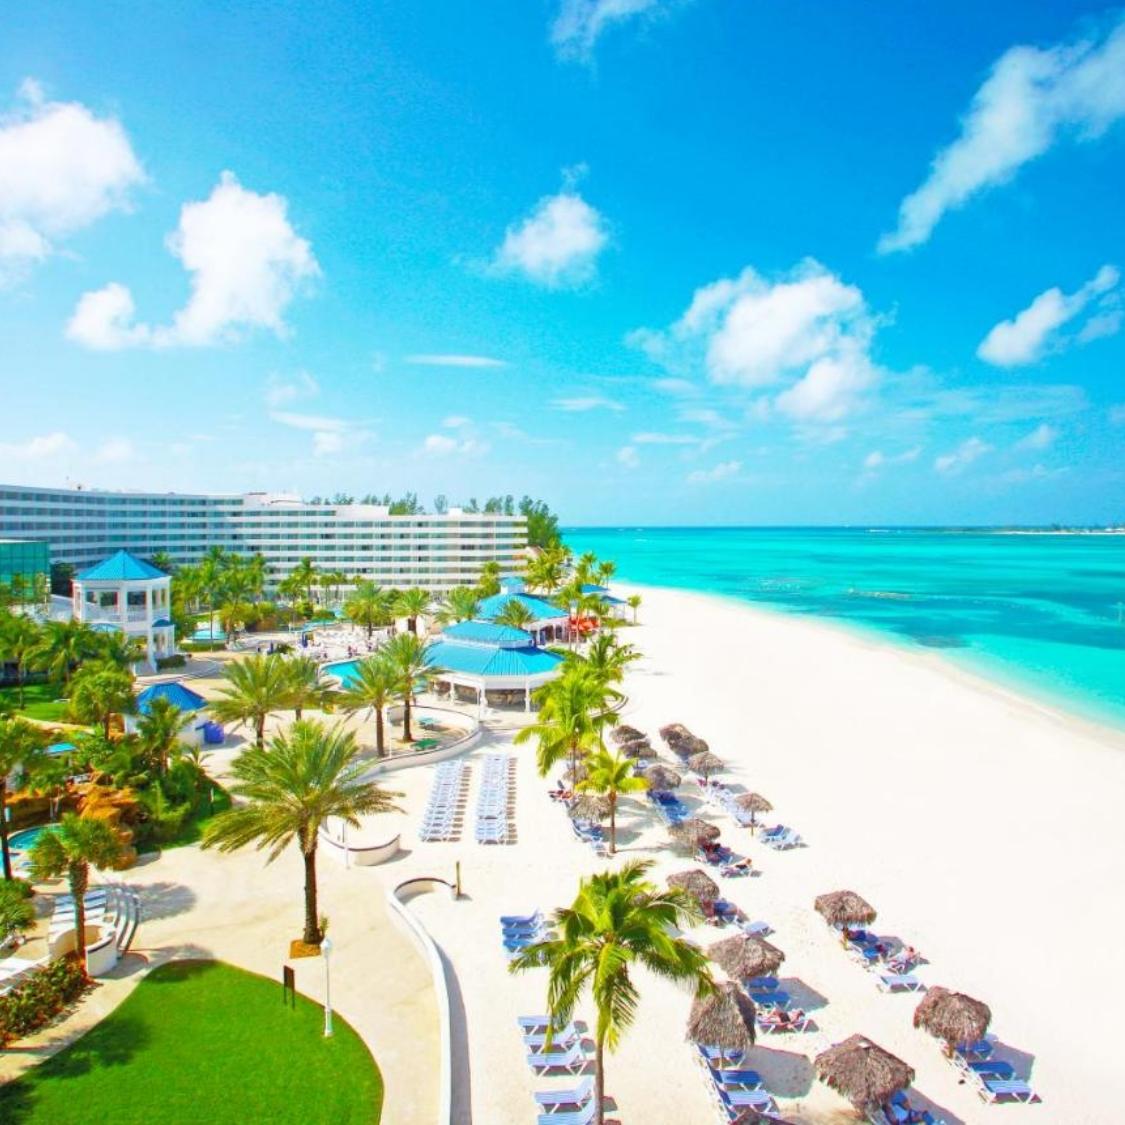 Hoteles Meliá con 35% descuento este verano